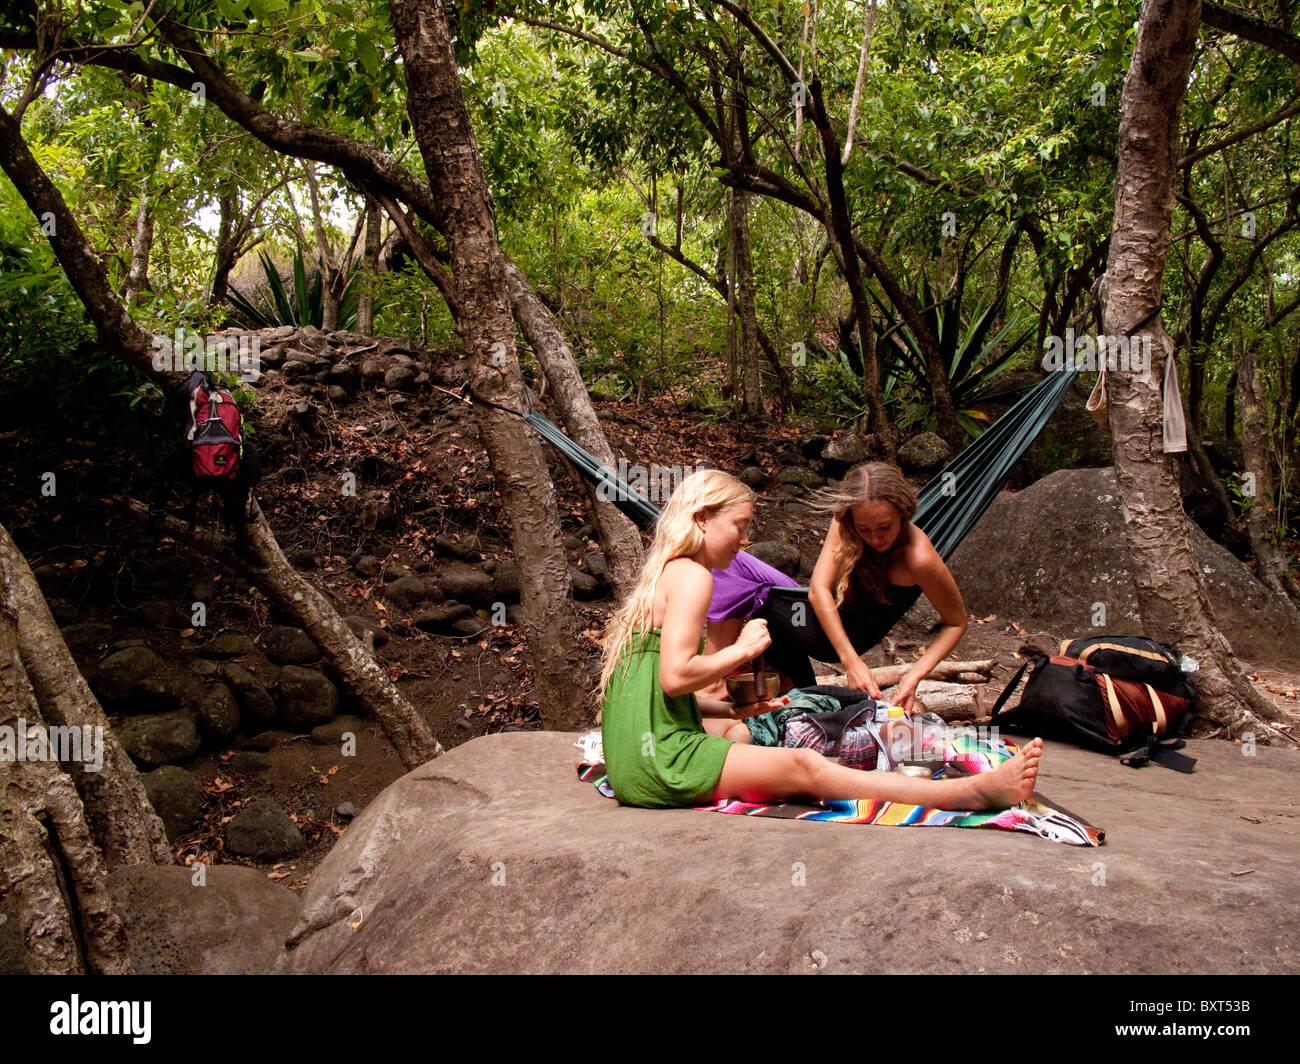 Dos mujeres relajándose en un camping en Valle Kalalau, Costa Na Pali, Kauai Foto de stock